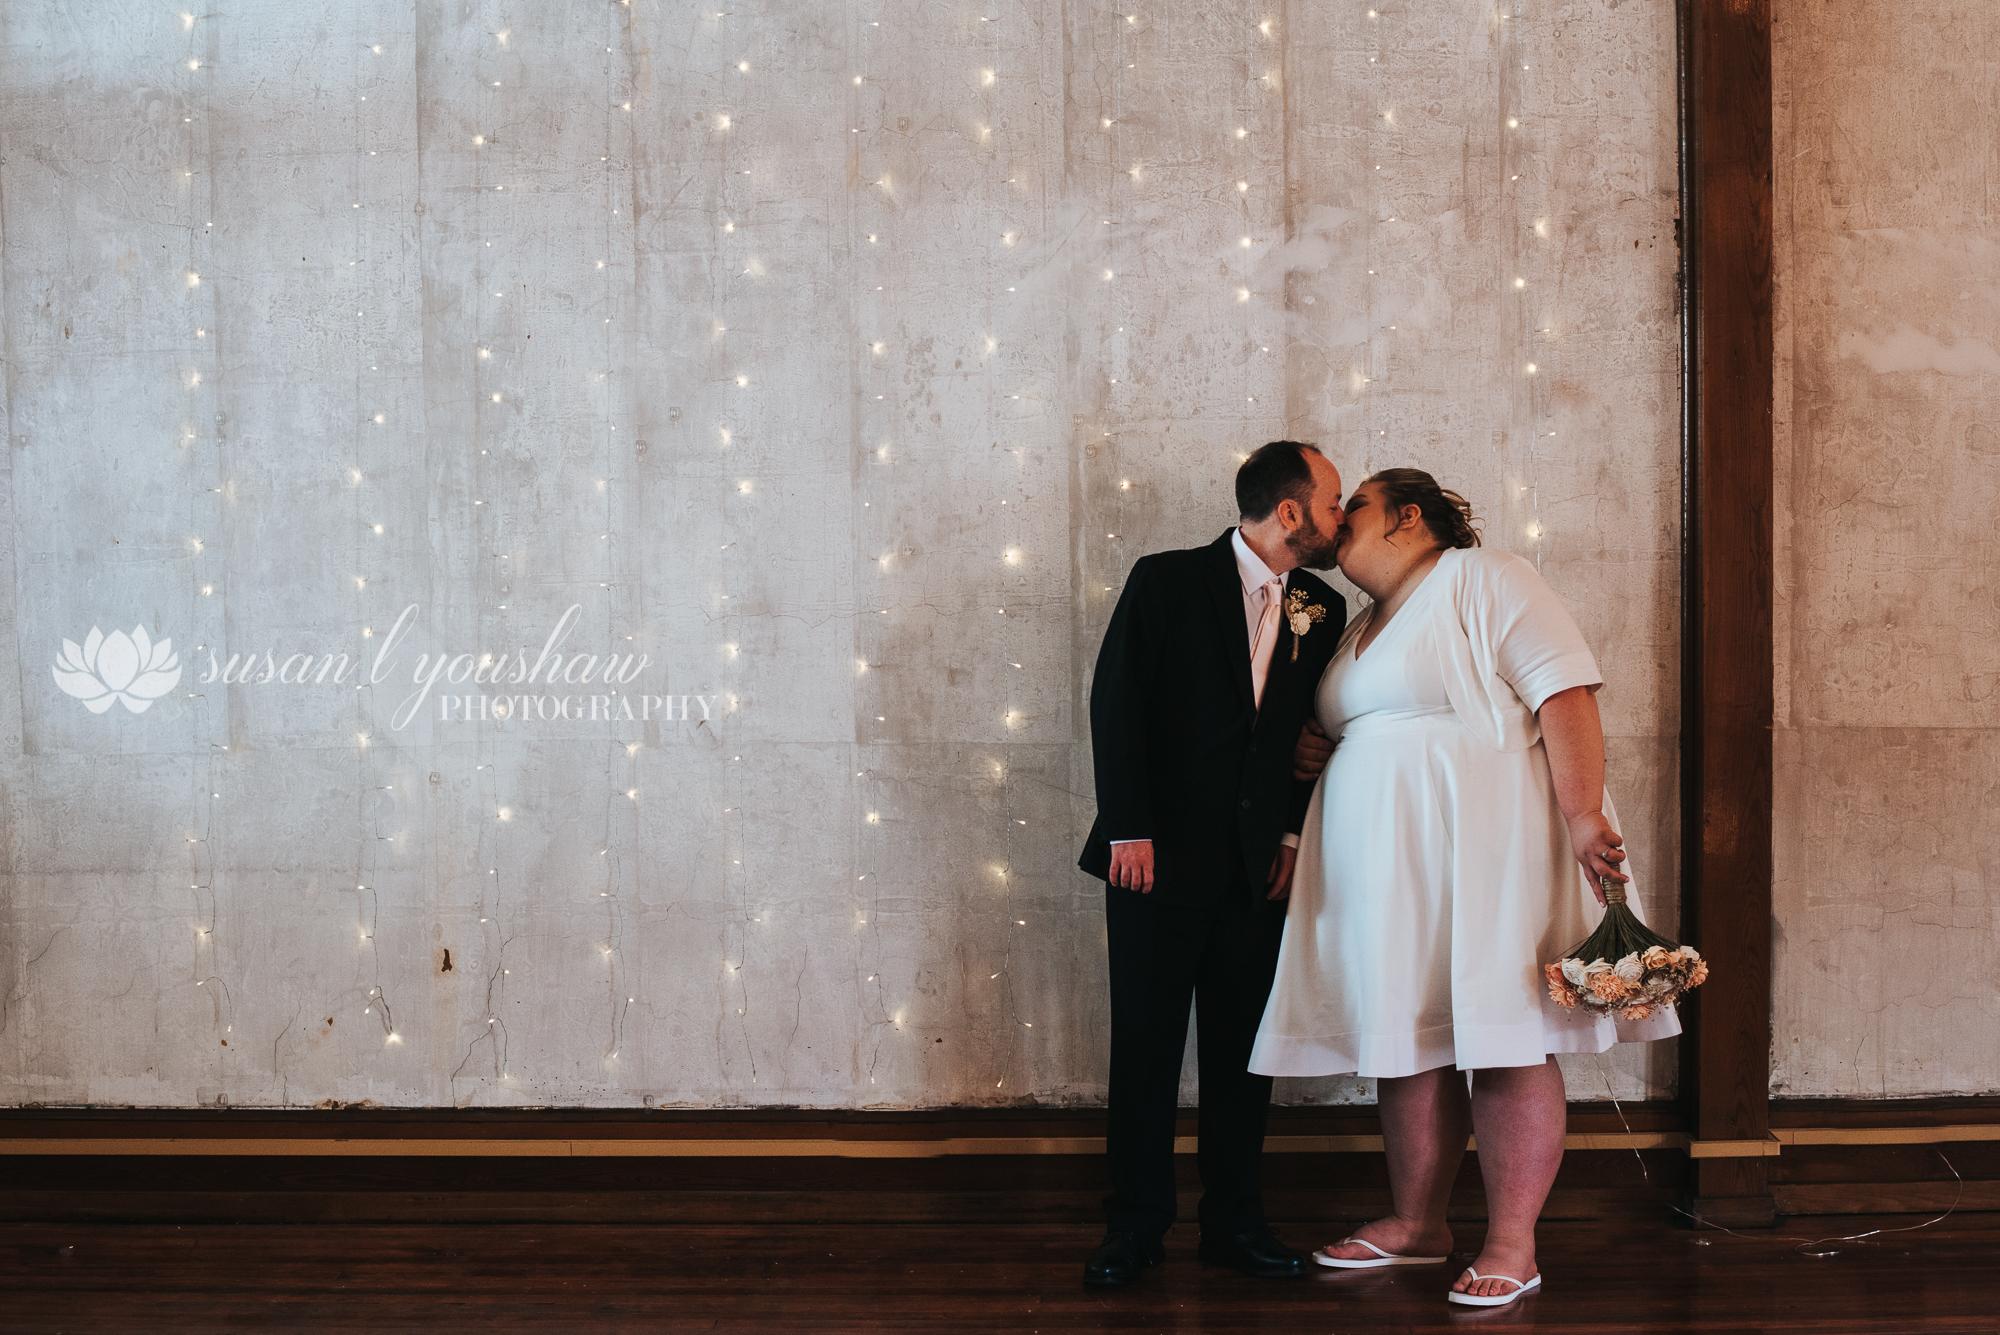 Bill and Sarah Wedding Photos 06-08-2019 SLY Photography -12.jpg